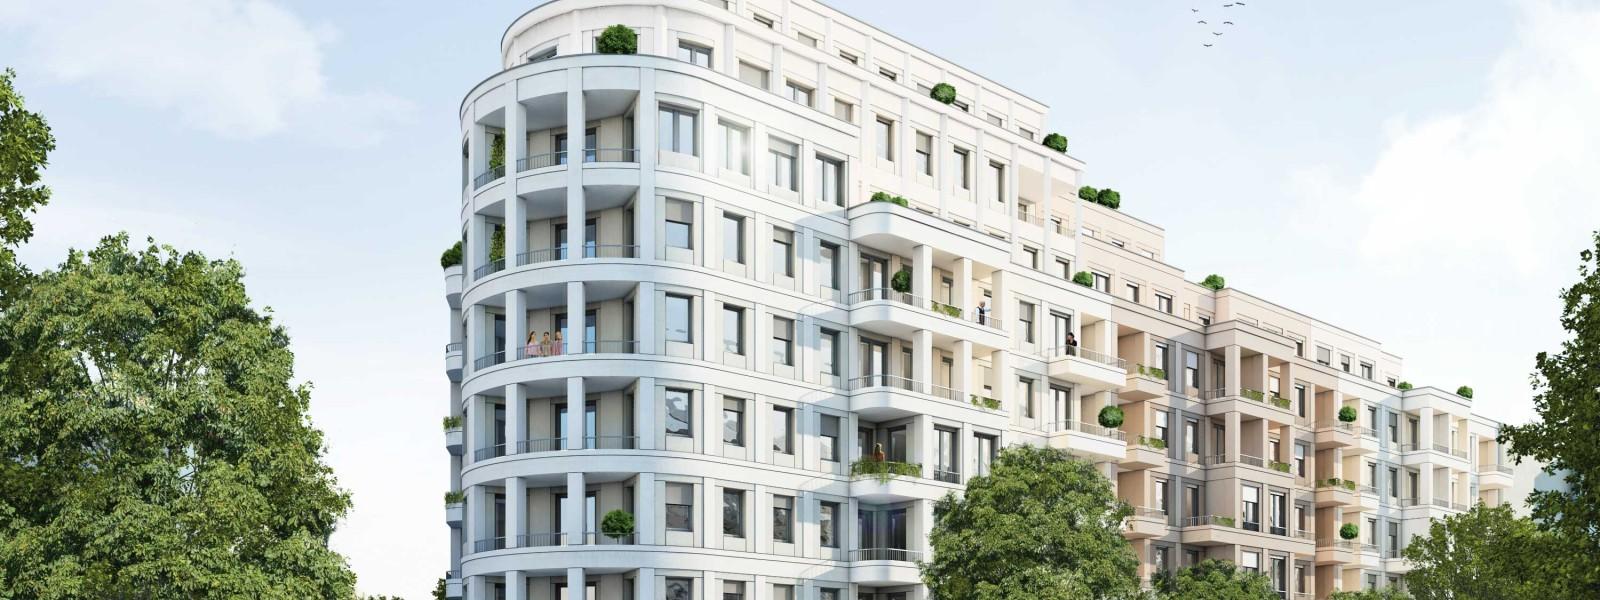 Quartier Voltaire – New Development in Central Berlin